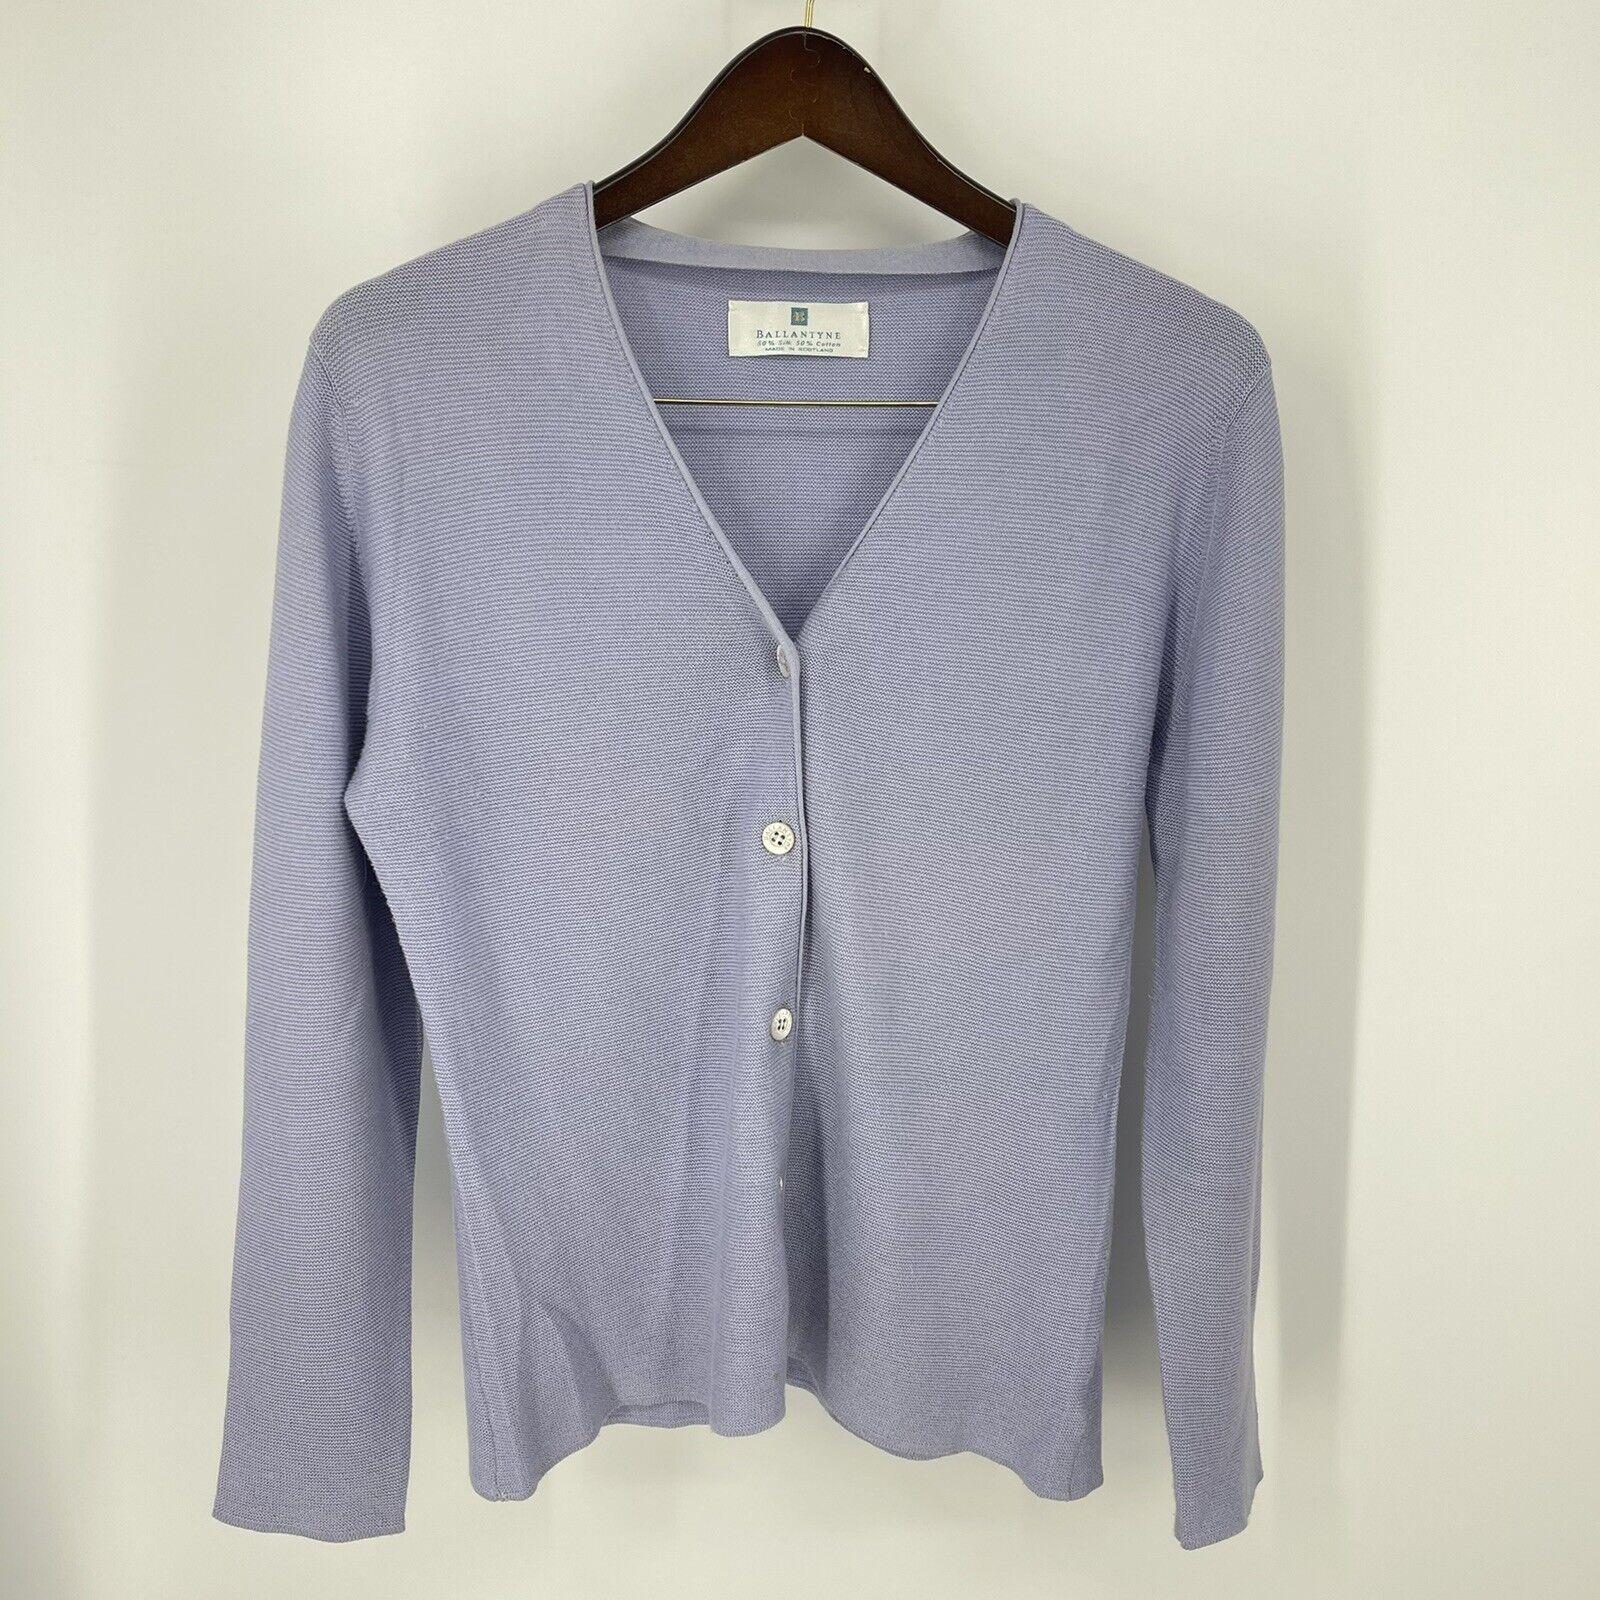 Ballantyne Silk Blend Knitted Women's Cardigan Sw… - image 1